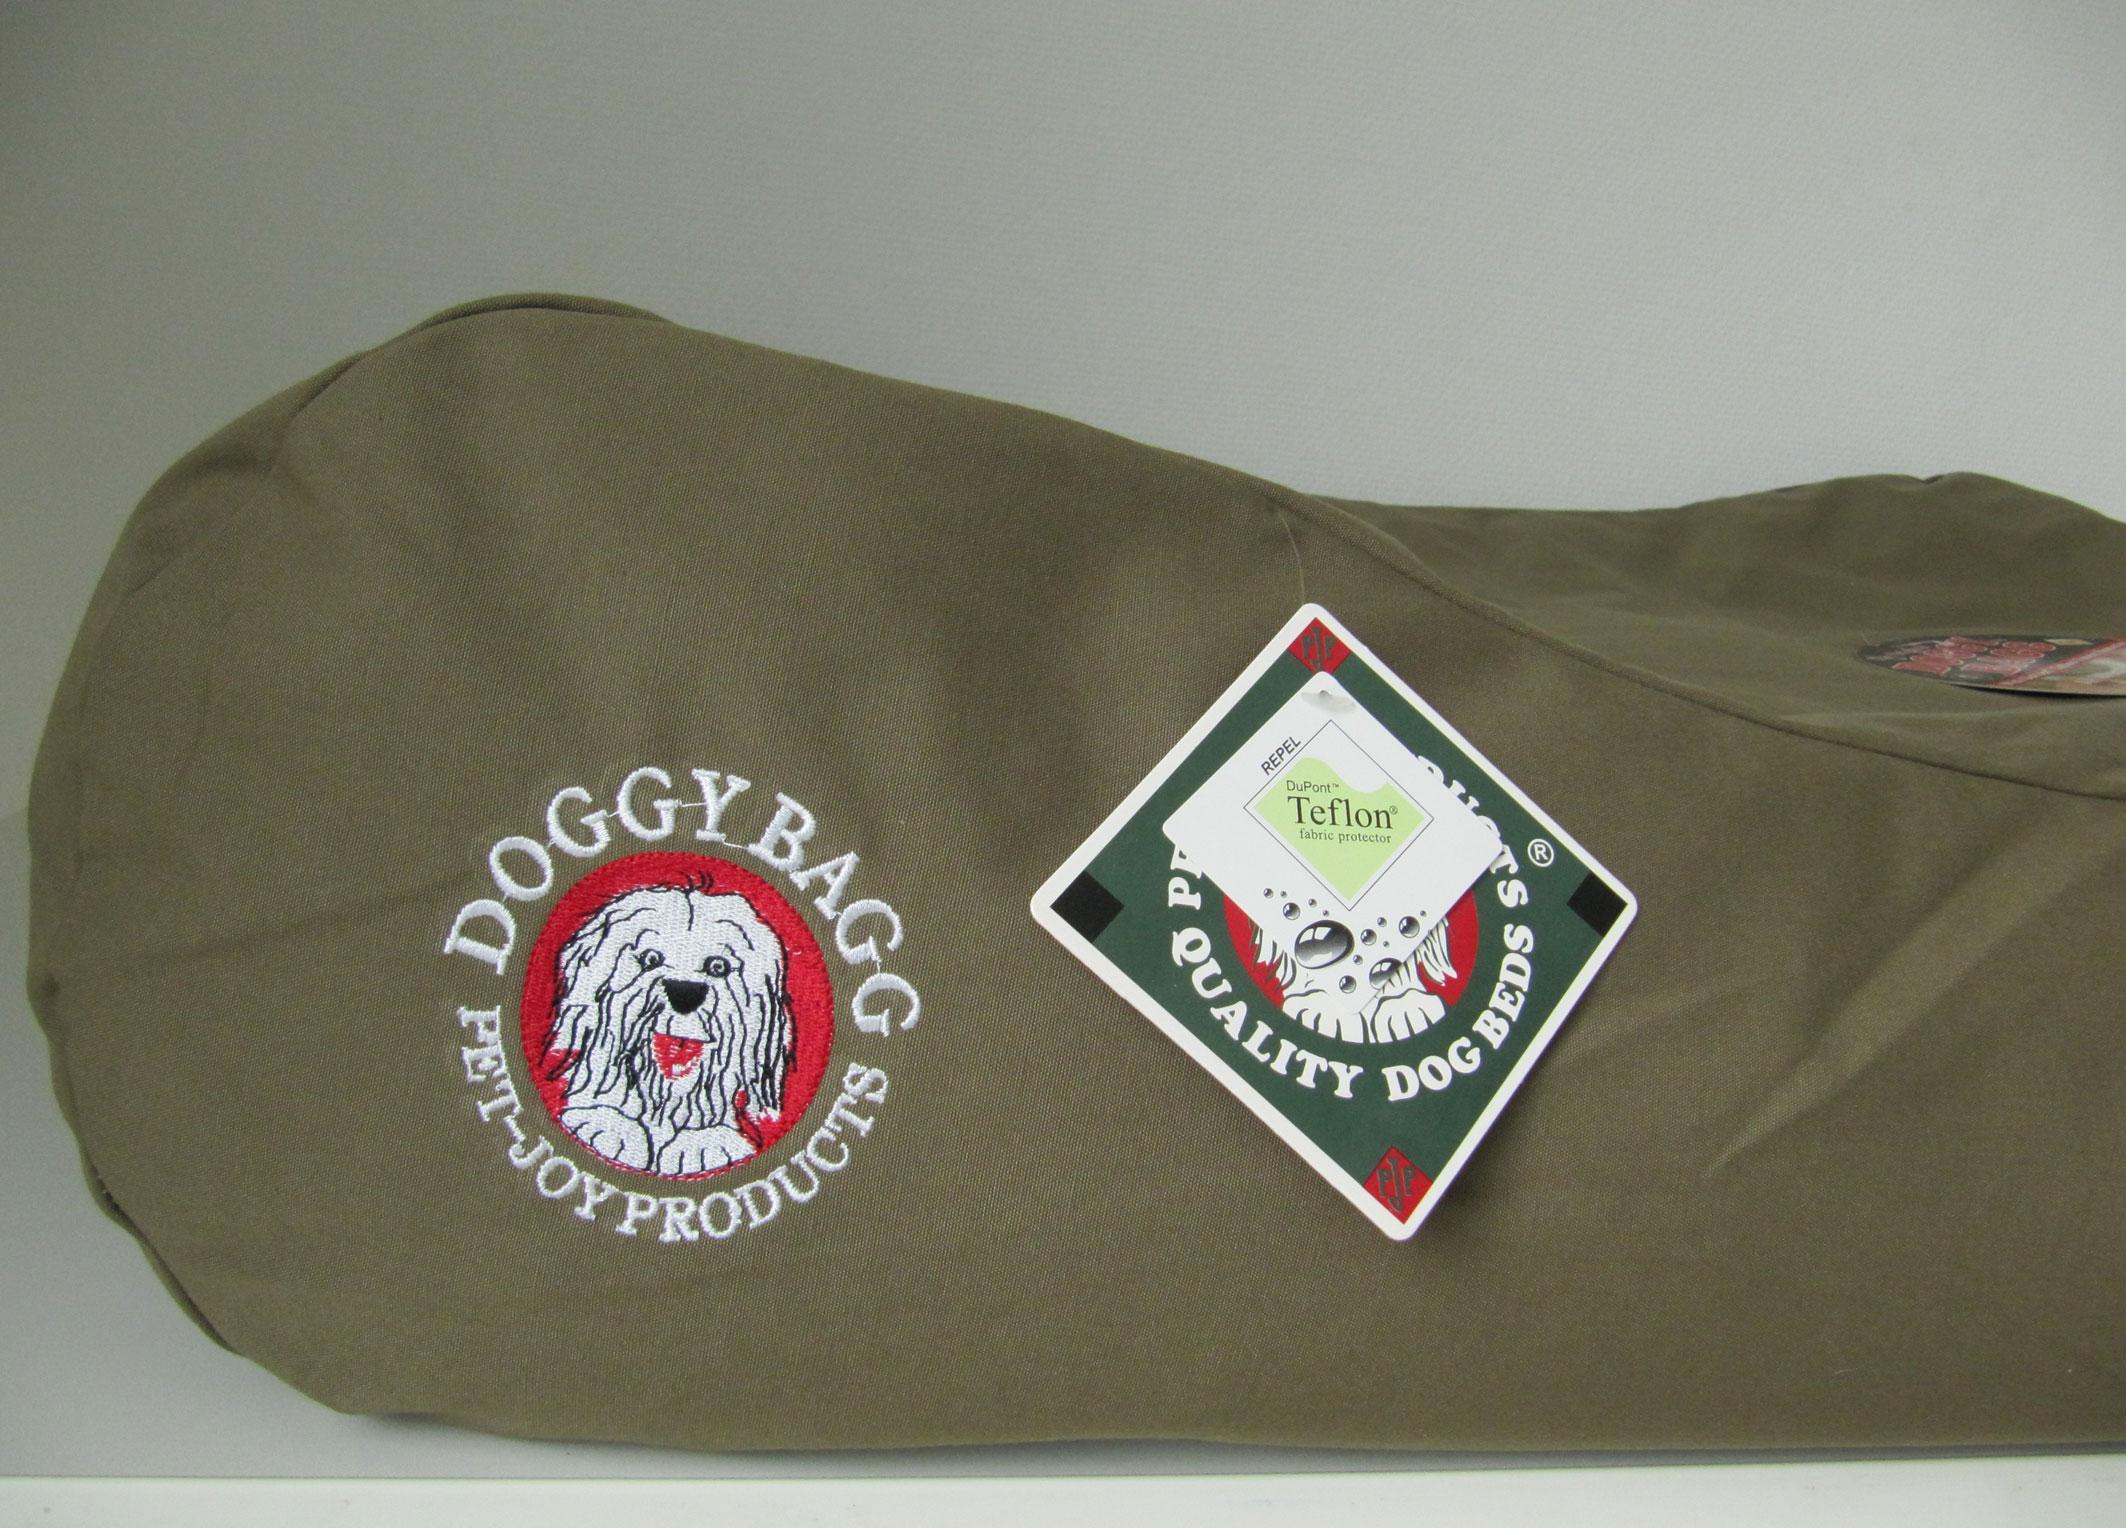 Hundebett Hundekissen Doggy Bagg Original Gr. XL Kangeroo / deep Camel Bild 2